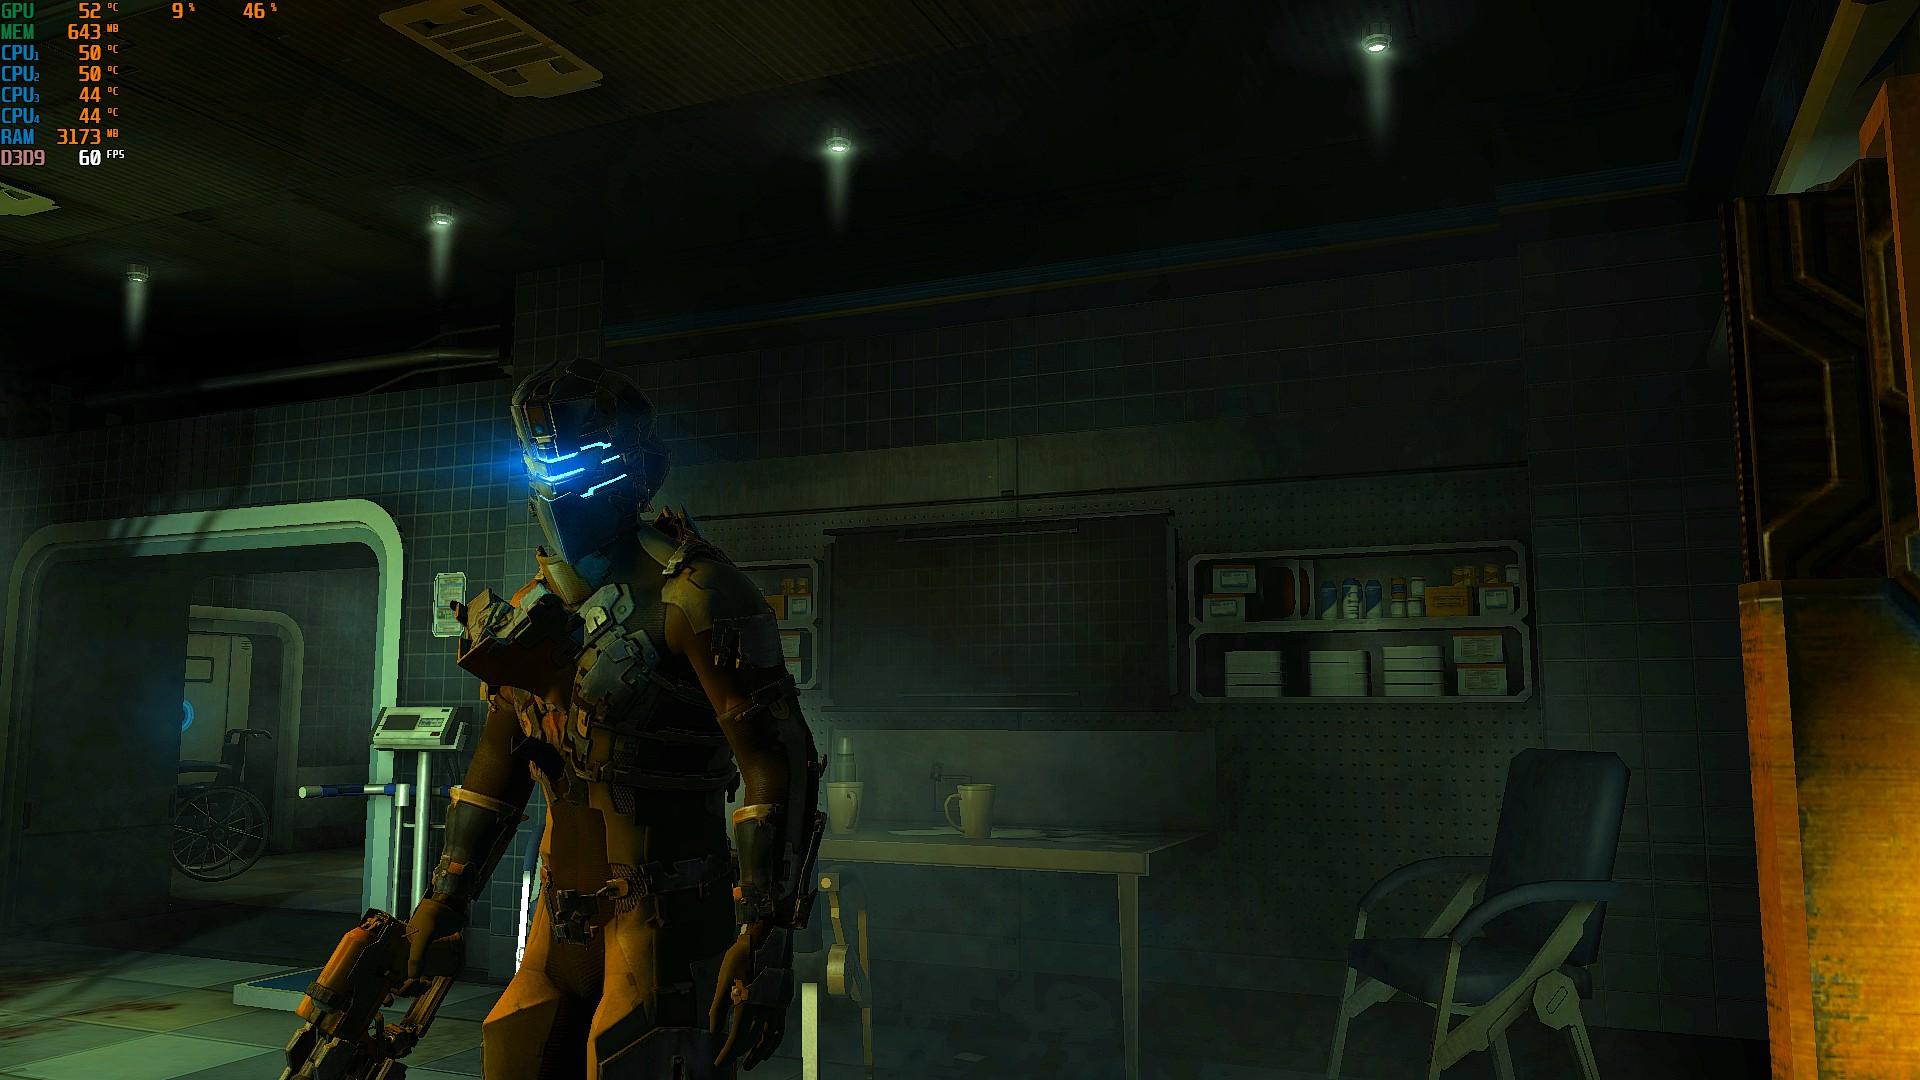 00048.Jpg - Dead Space 2